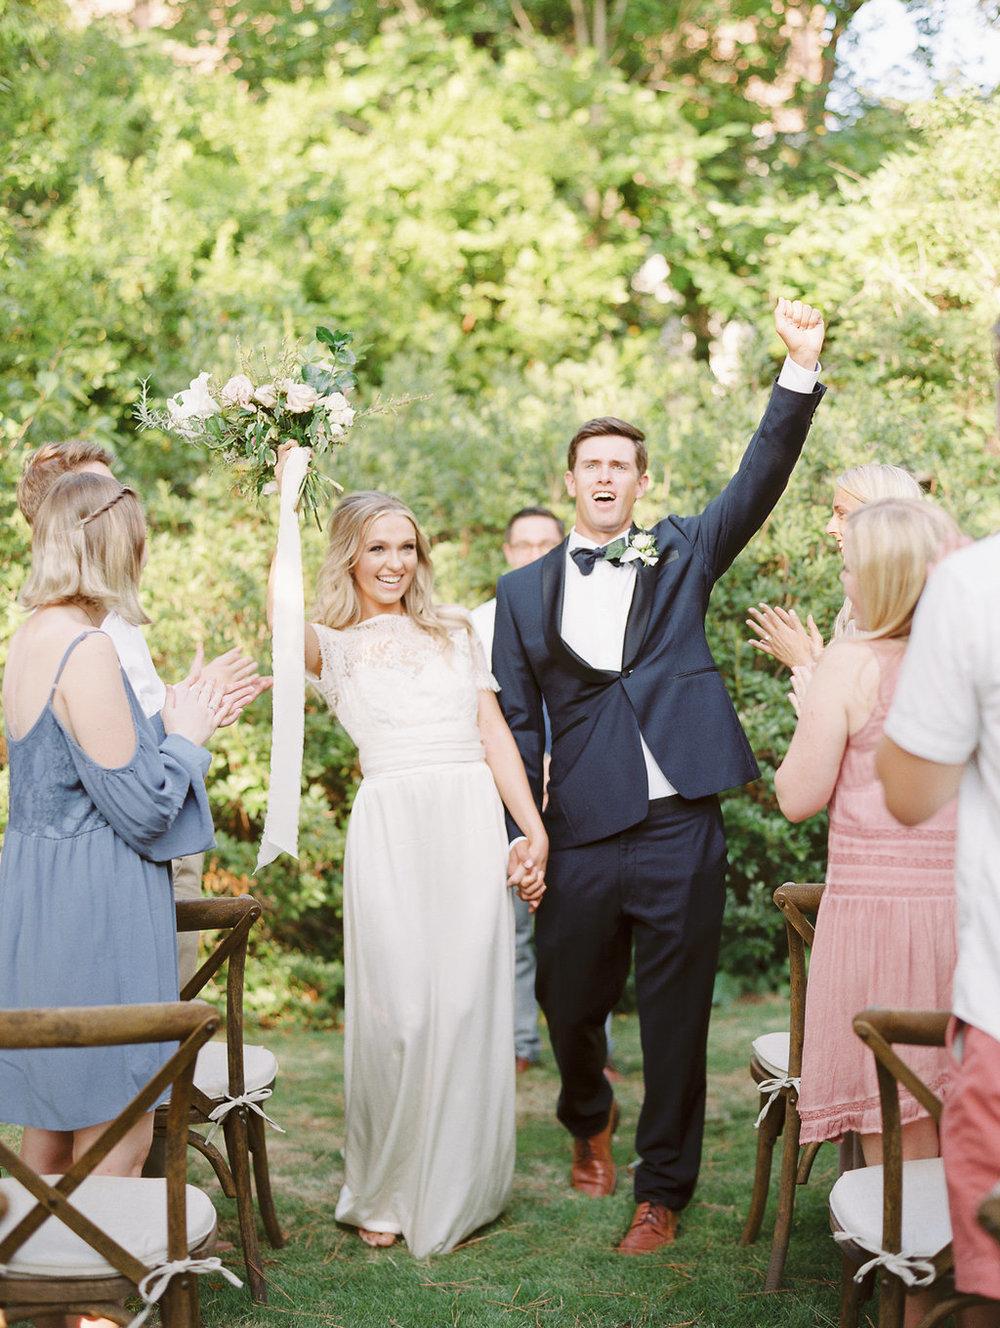 athens-founders-memorial-garden-wedding-photography-hannah-forsberg-atlanta-wedding-photographer-11.jpg